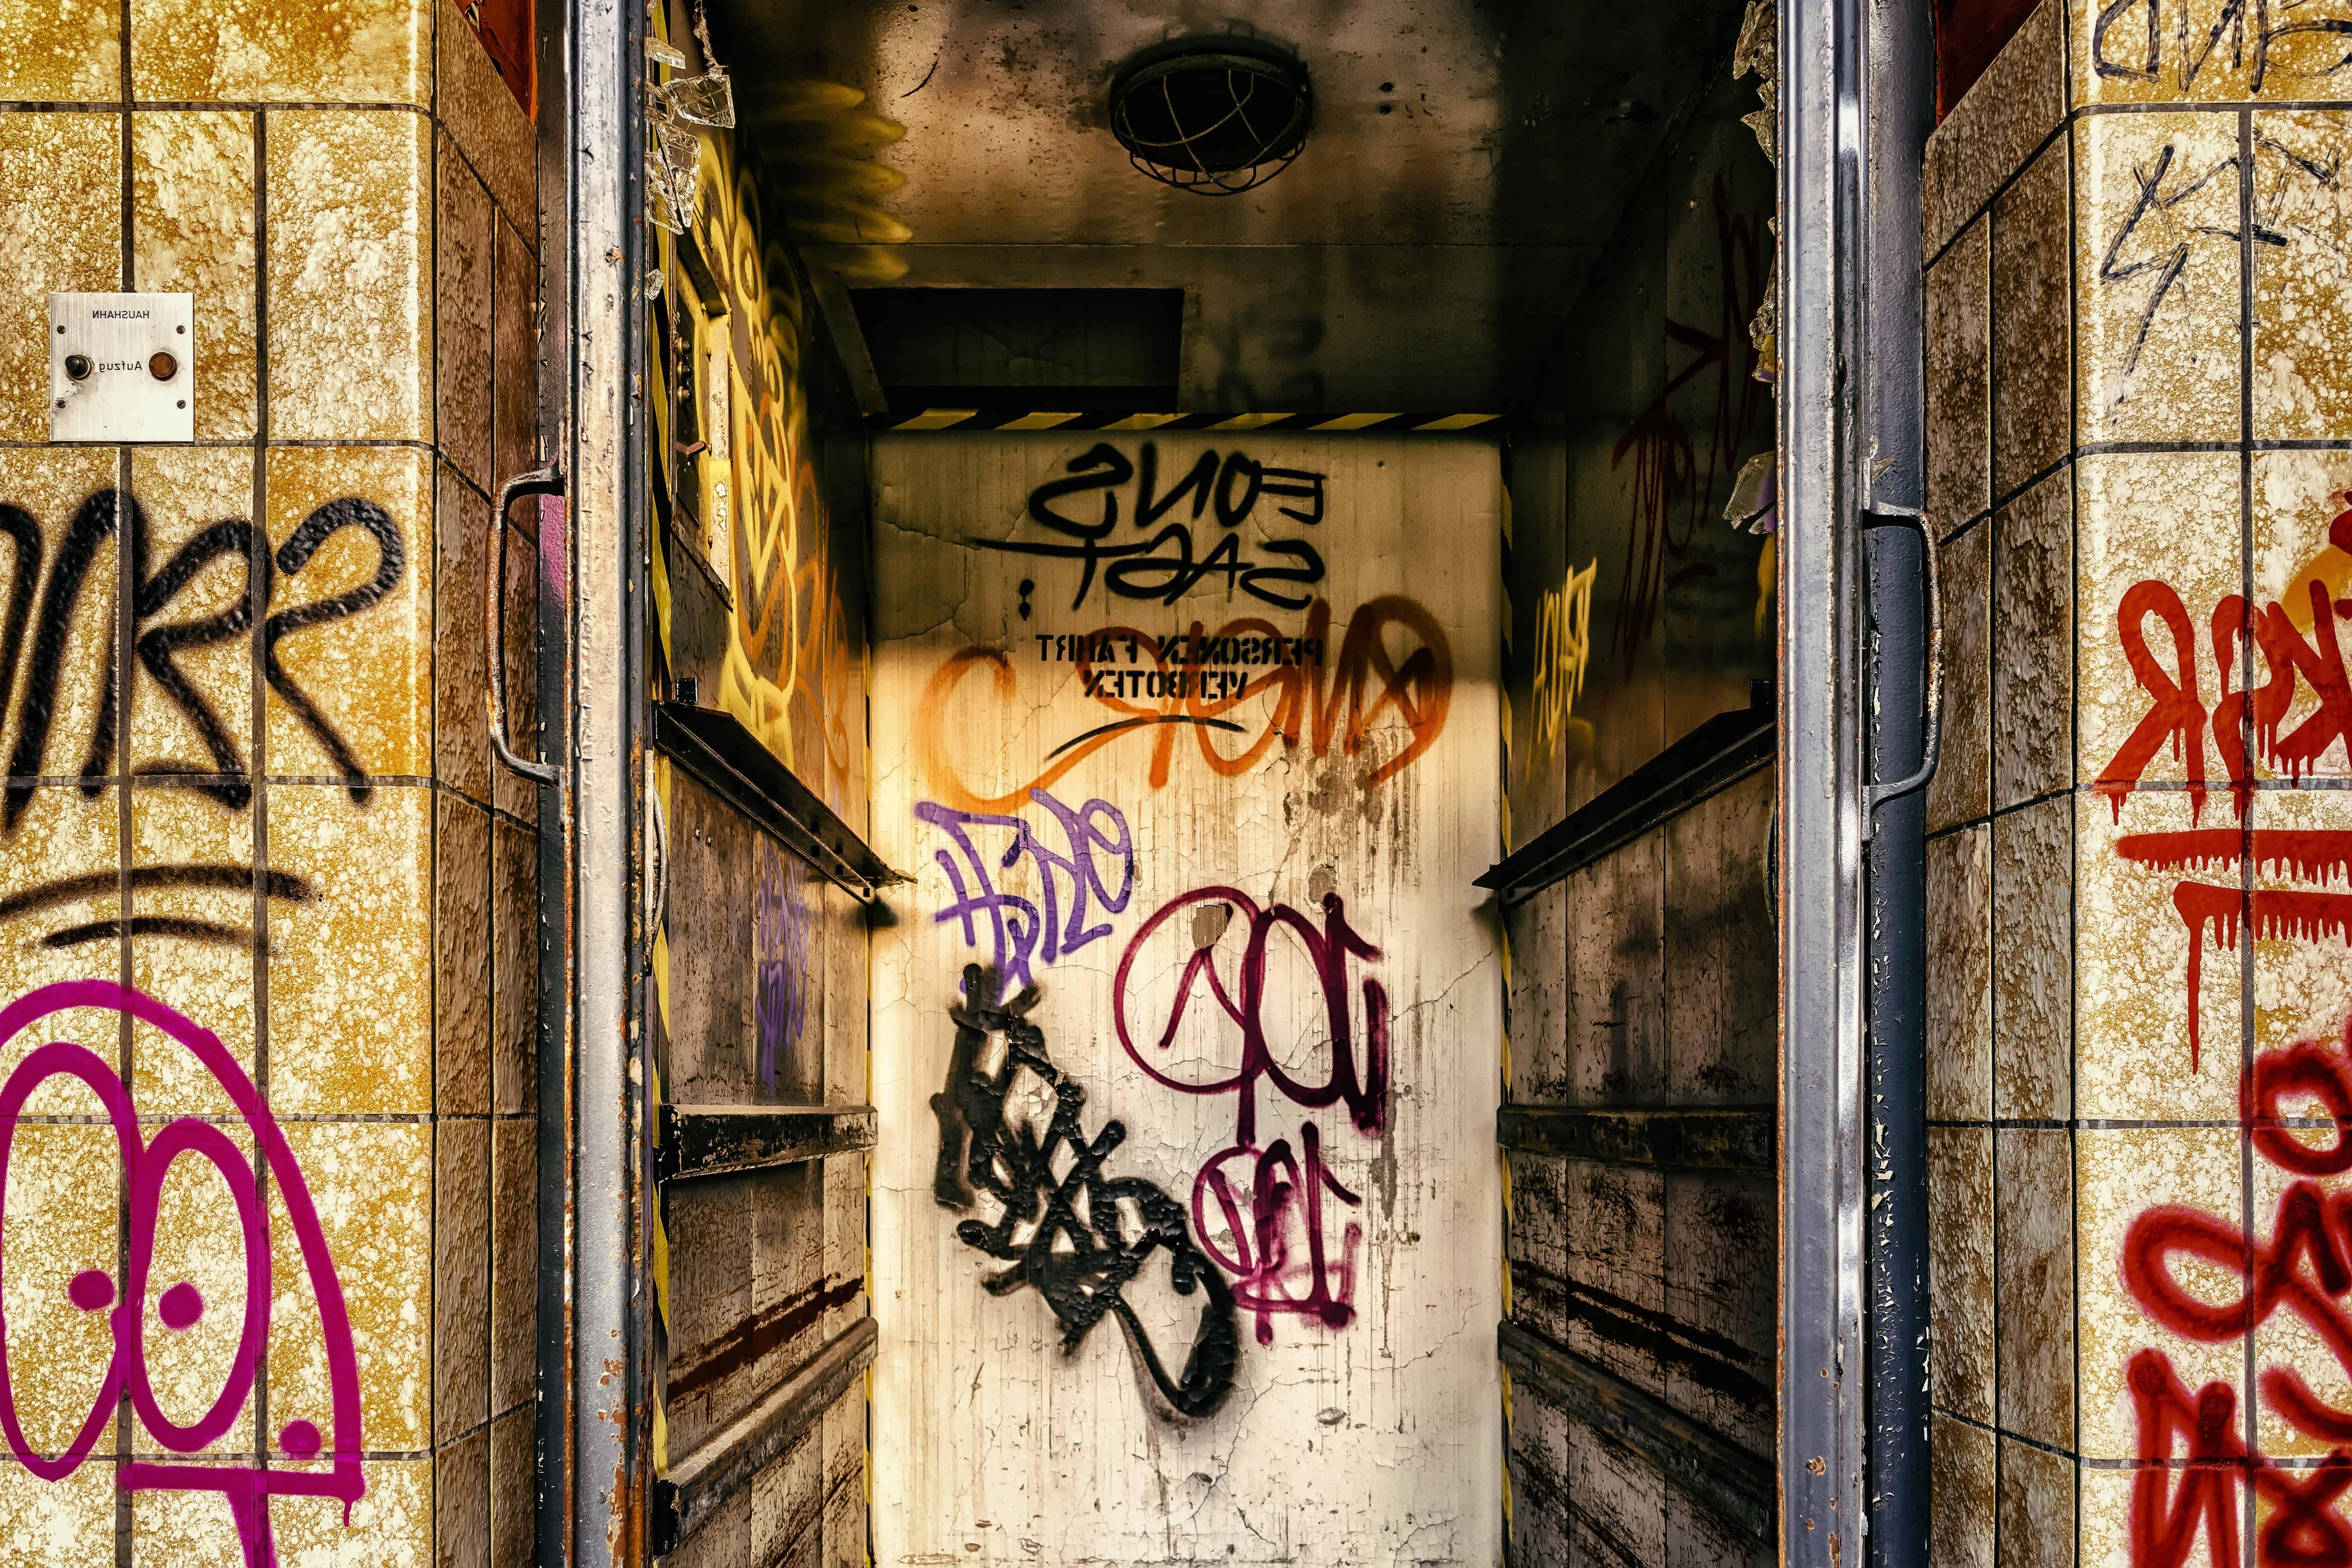 Free Picture Art Architecture Graffiti Urban Street